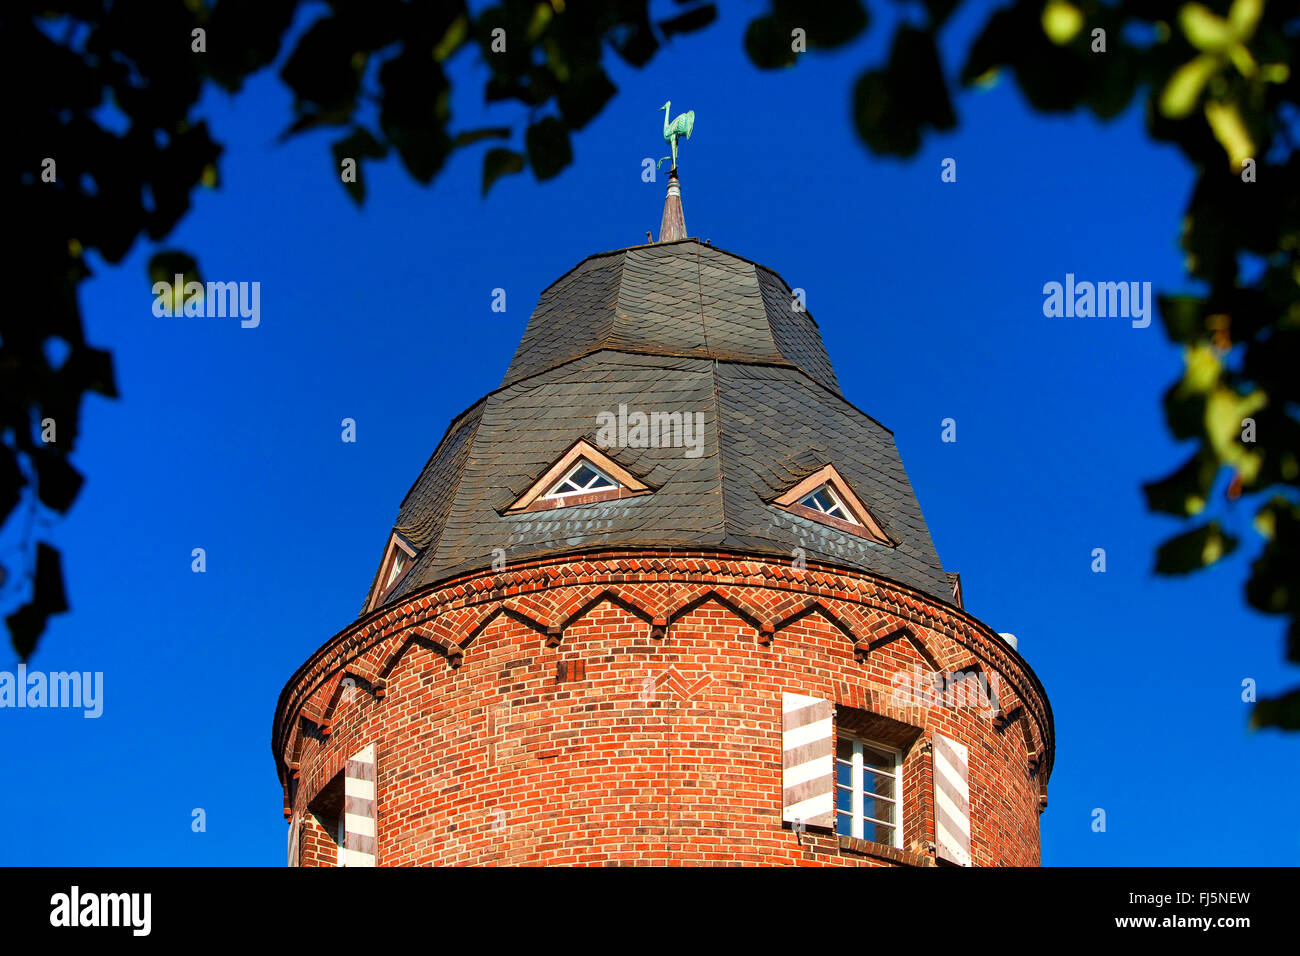 Muehlenturm with crane, heraldic animal of the town, Germany, North Rhine-Westphalia, Lower Rhine, Kranenburg - Stock Image